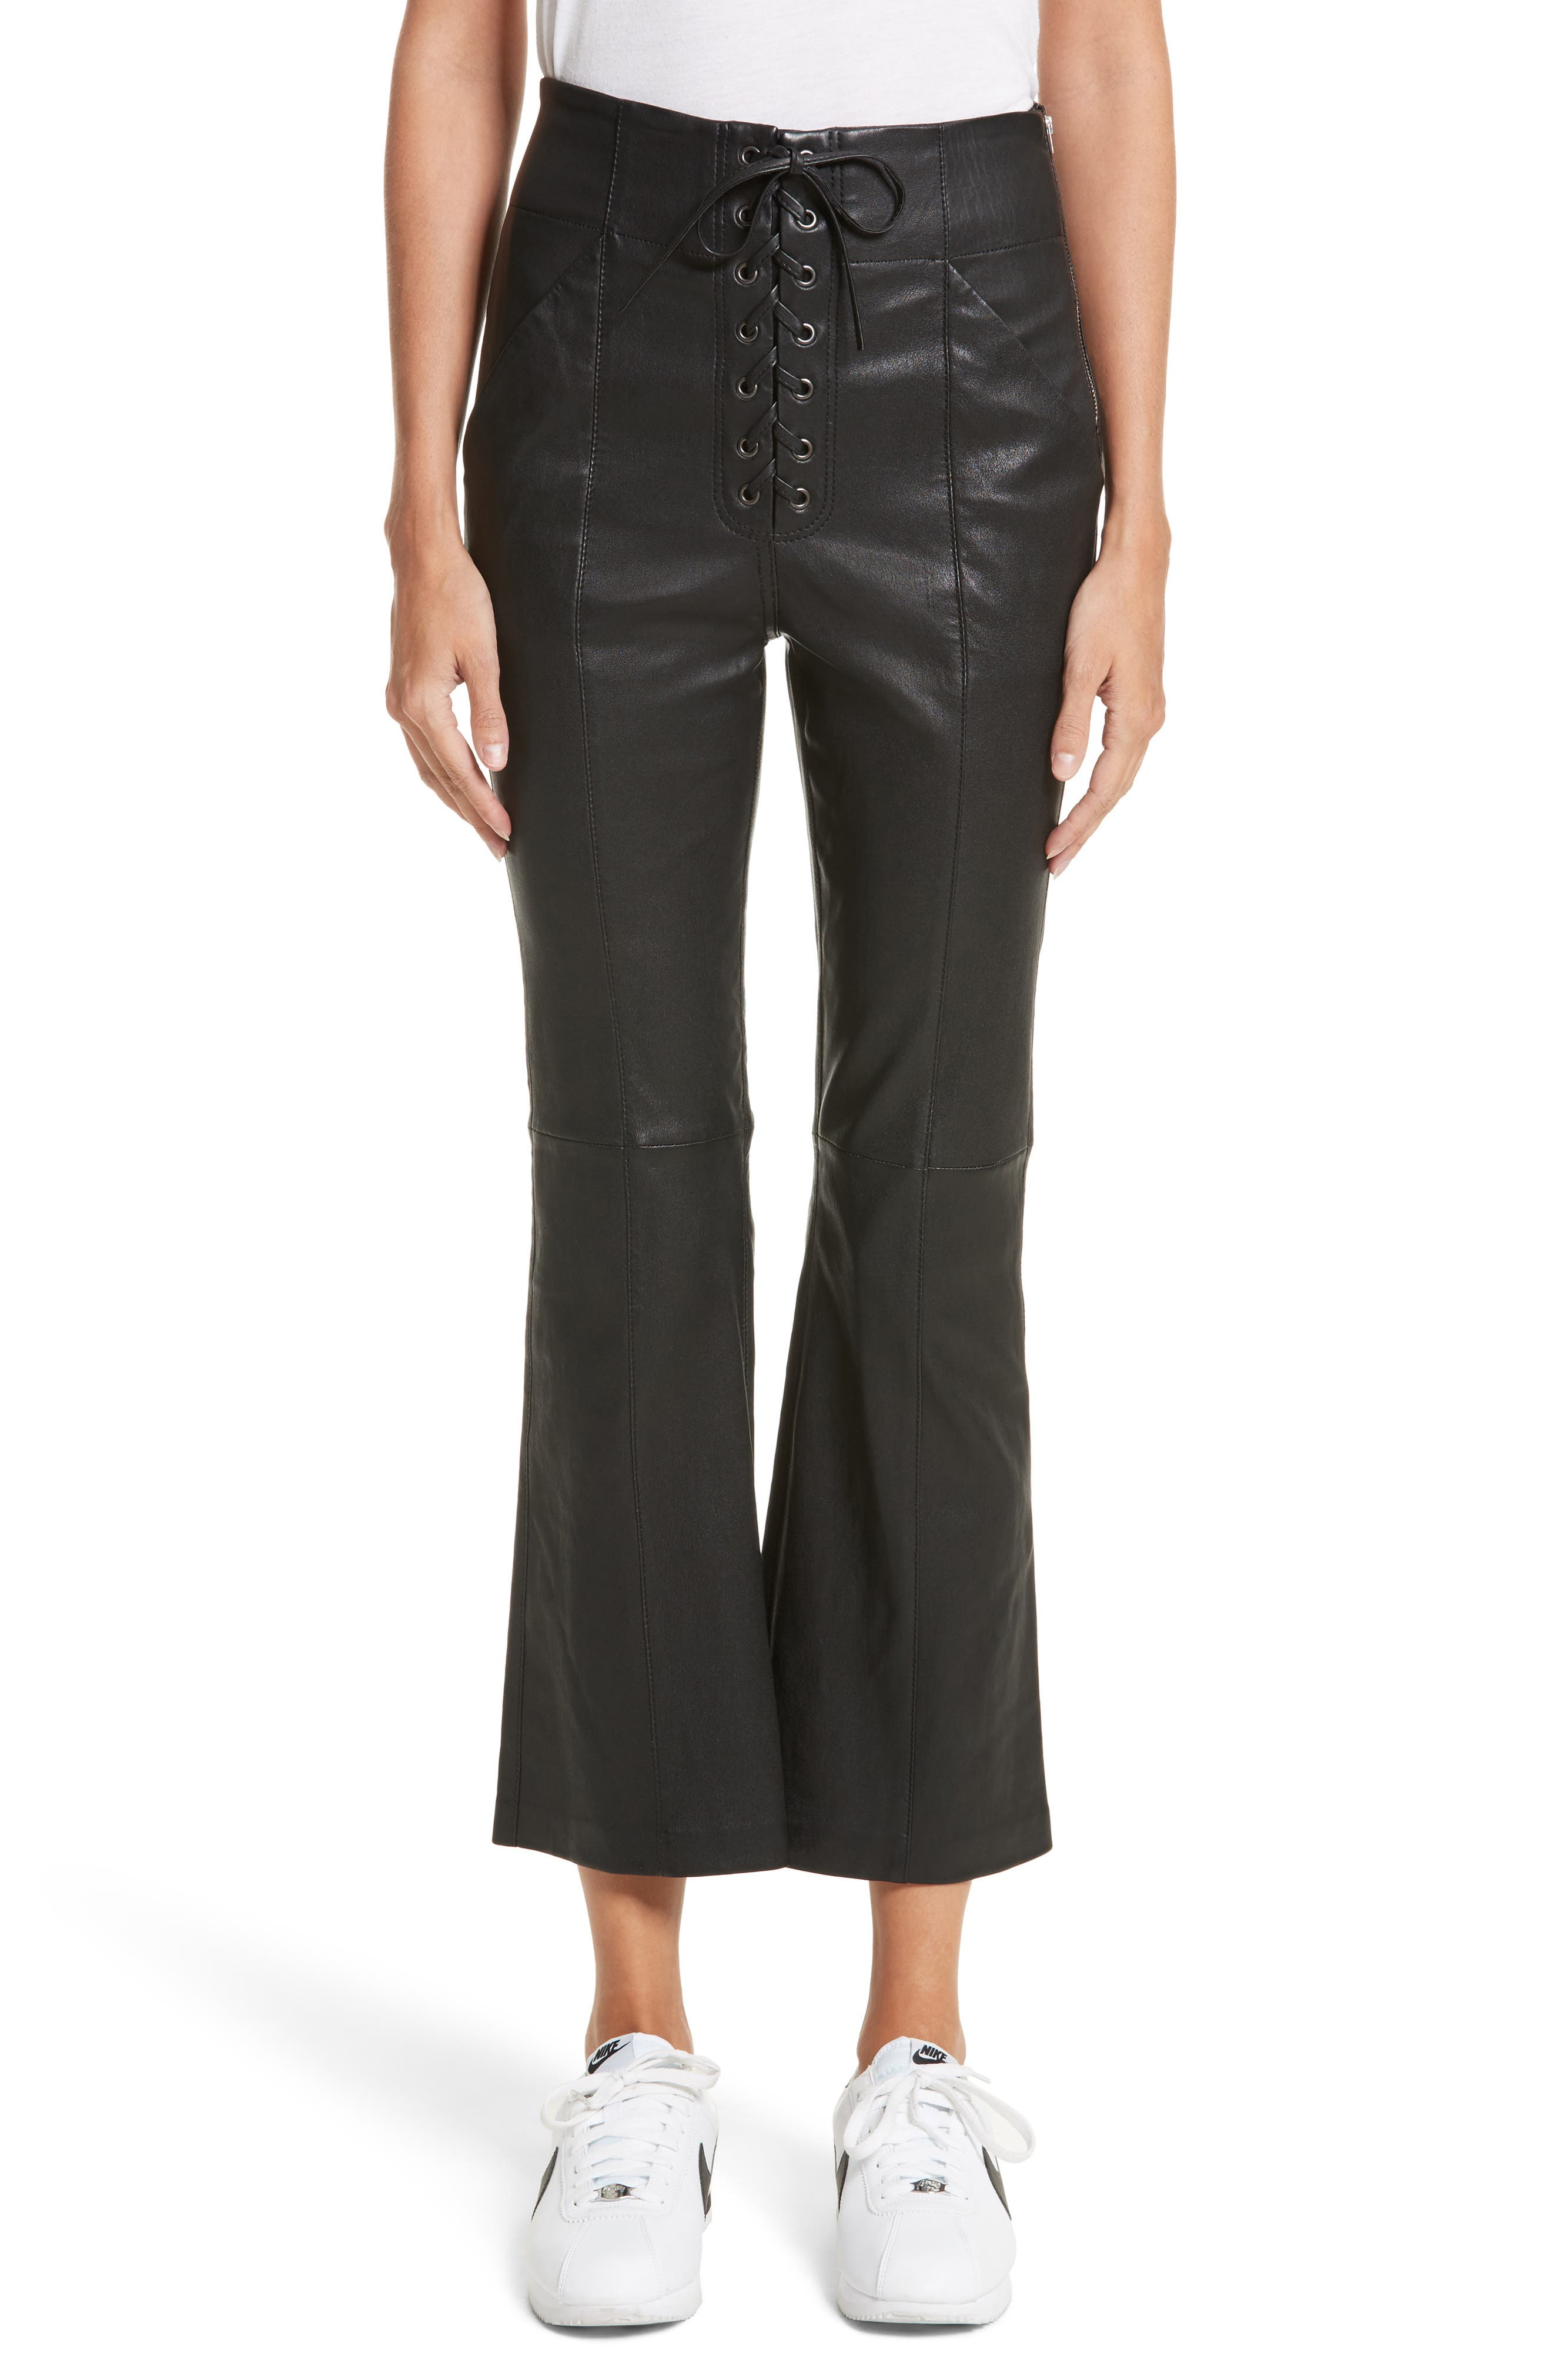 Alternate Image 1 Selected - A.L.C. Delia Lace Up Leather Pants